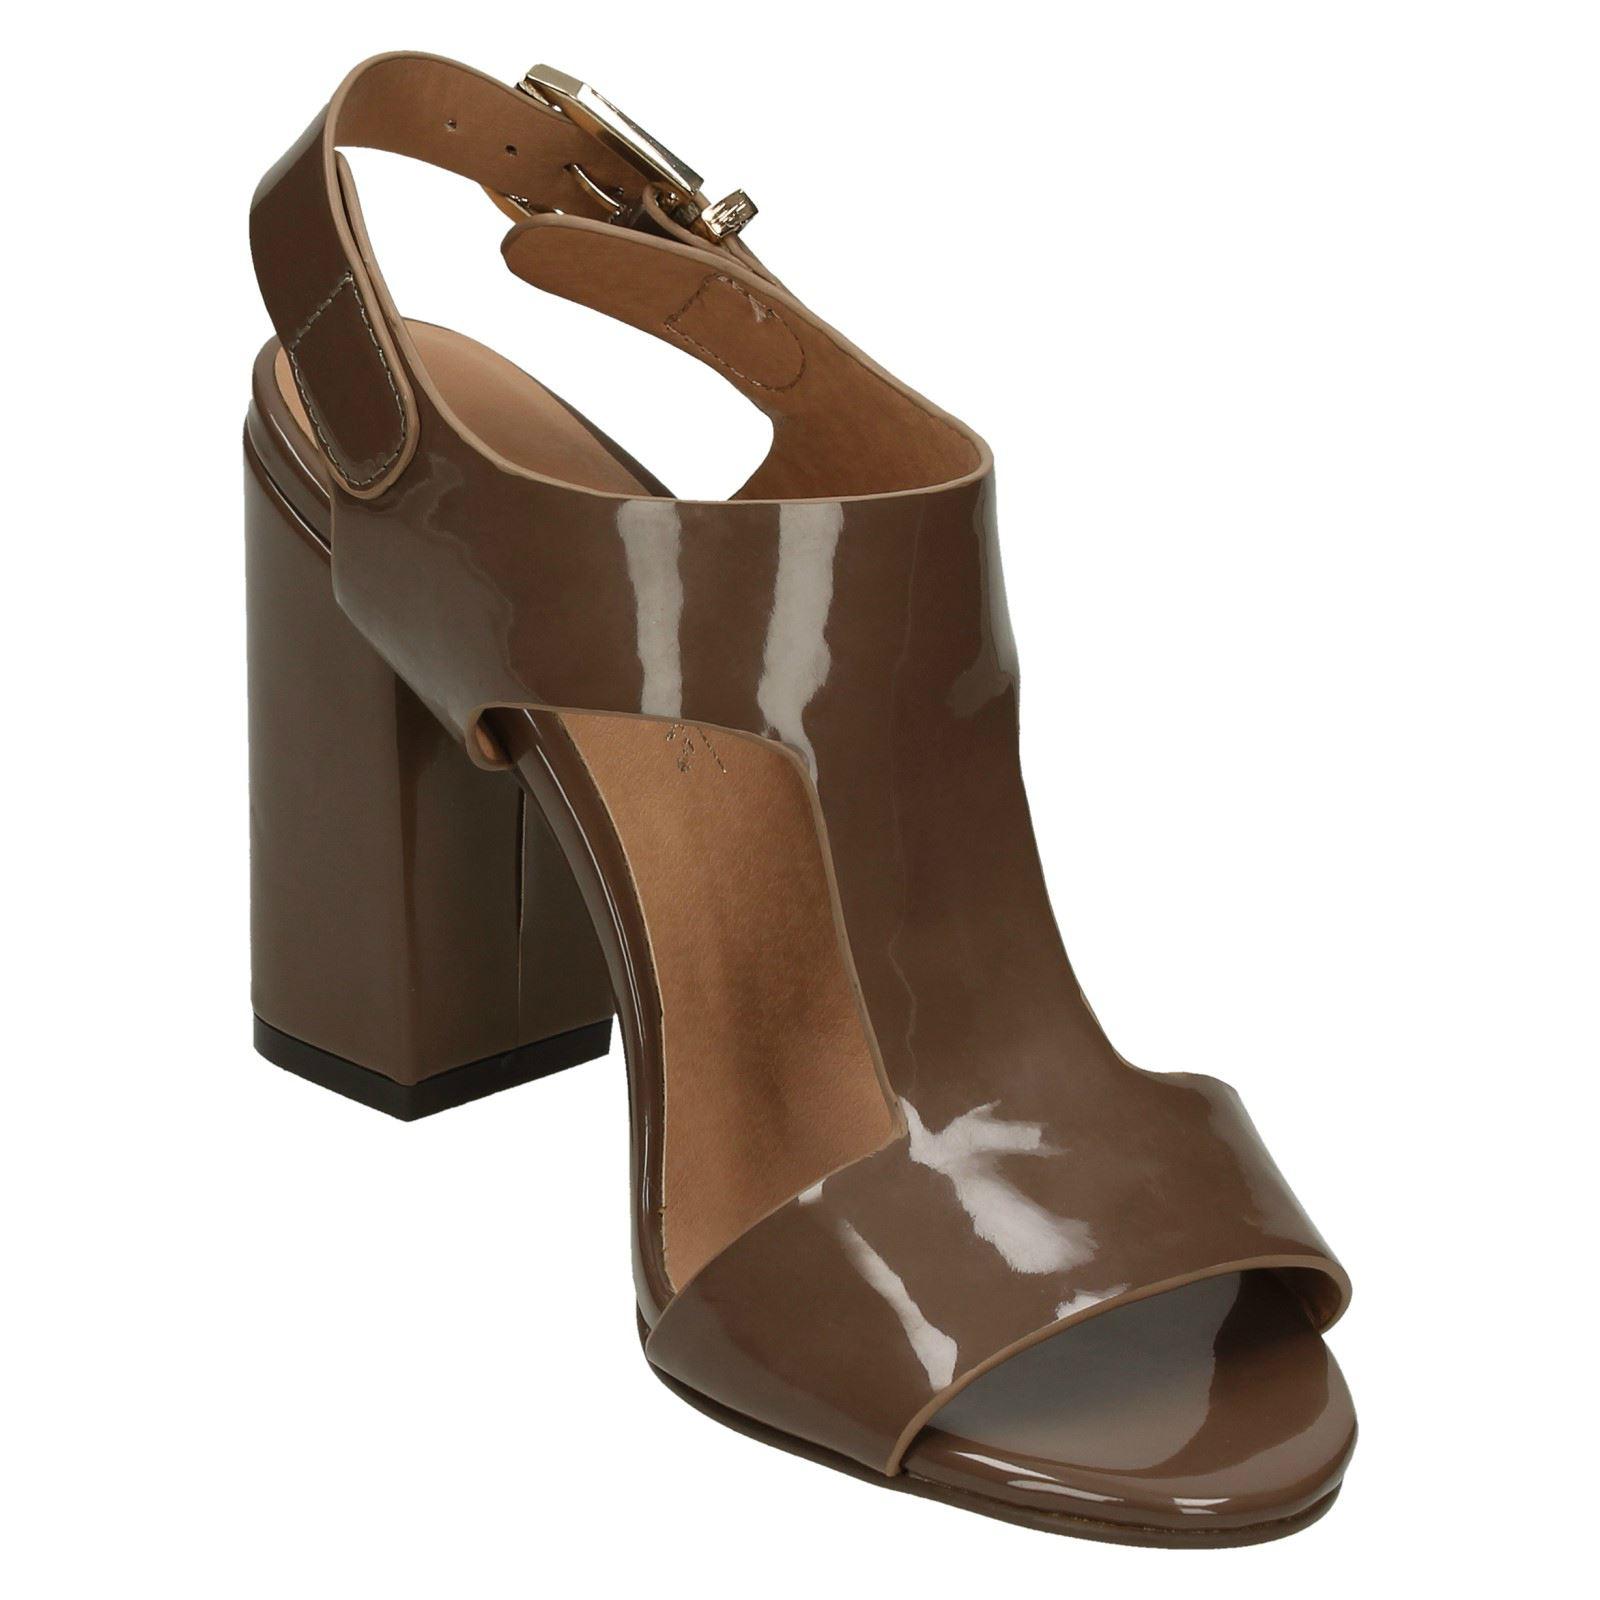 Style 645 Damenschuhe Anne Michelle Lsadies Chunky Heel Sandal